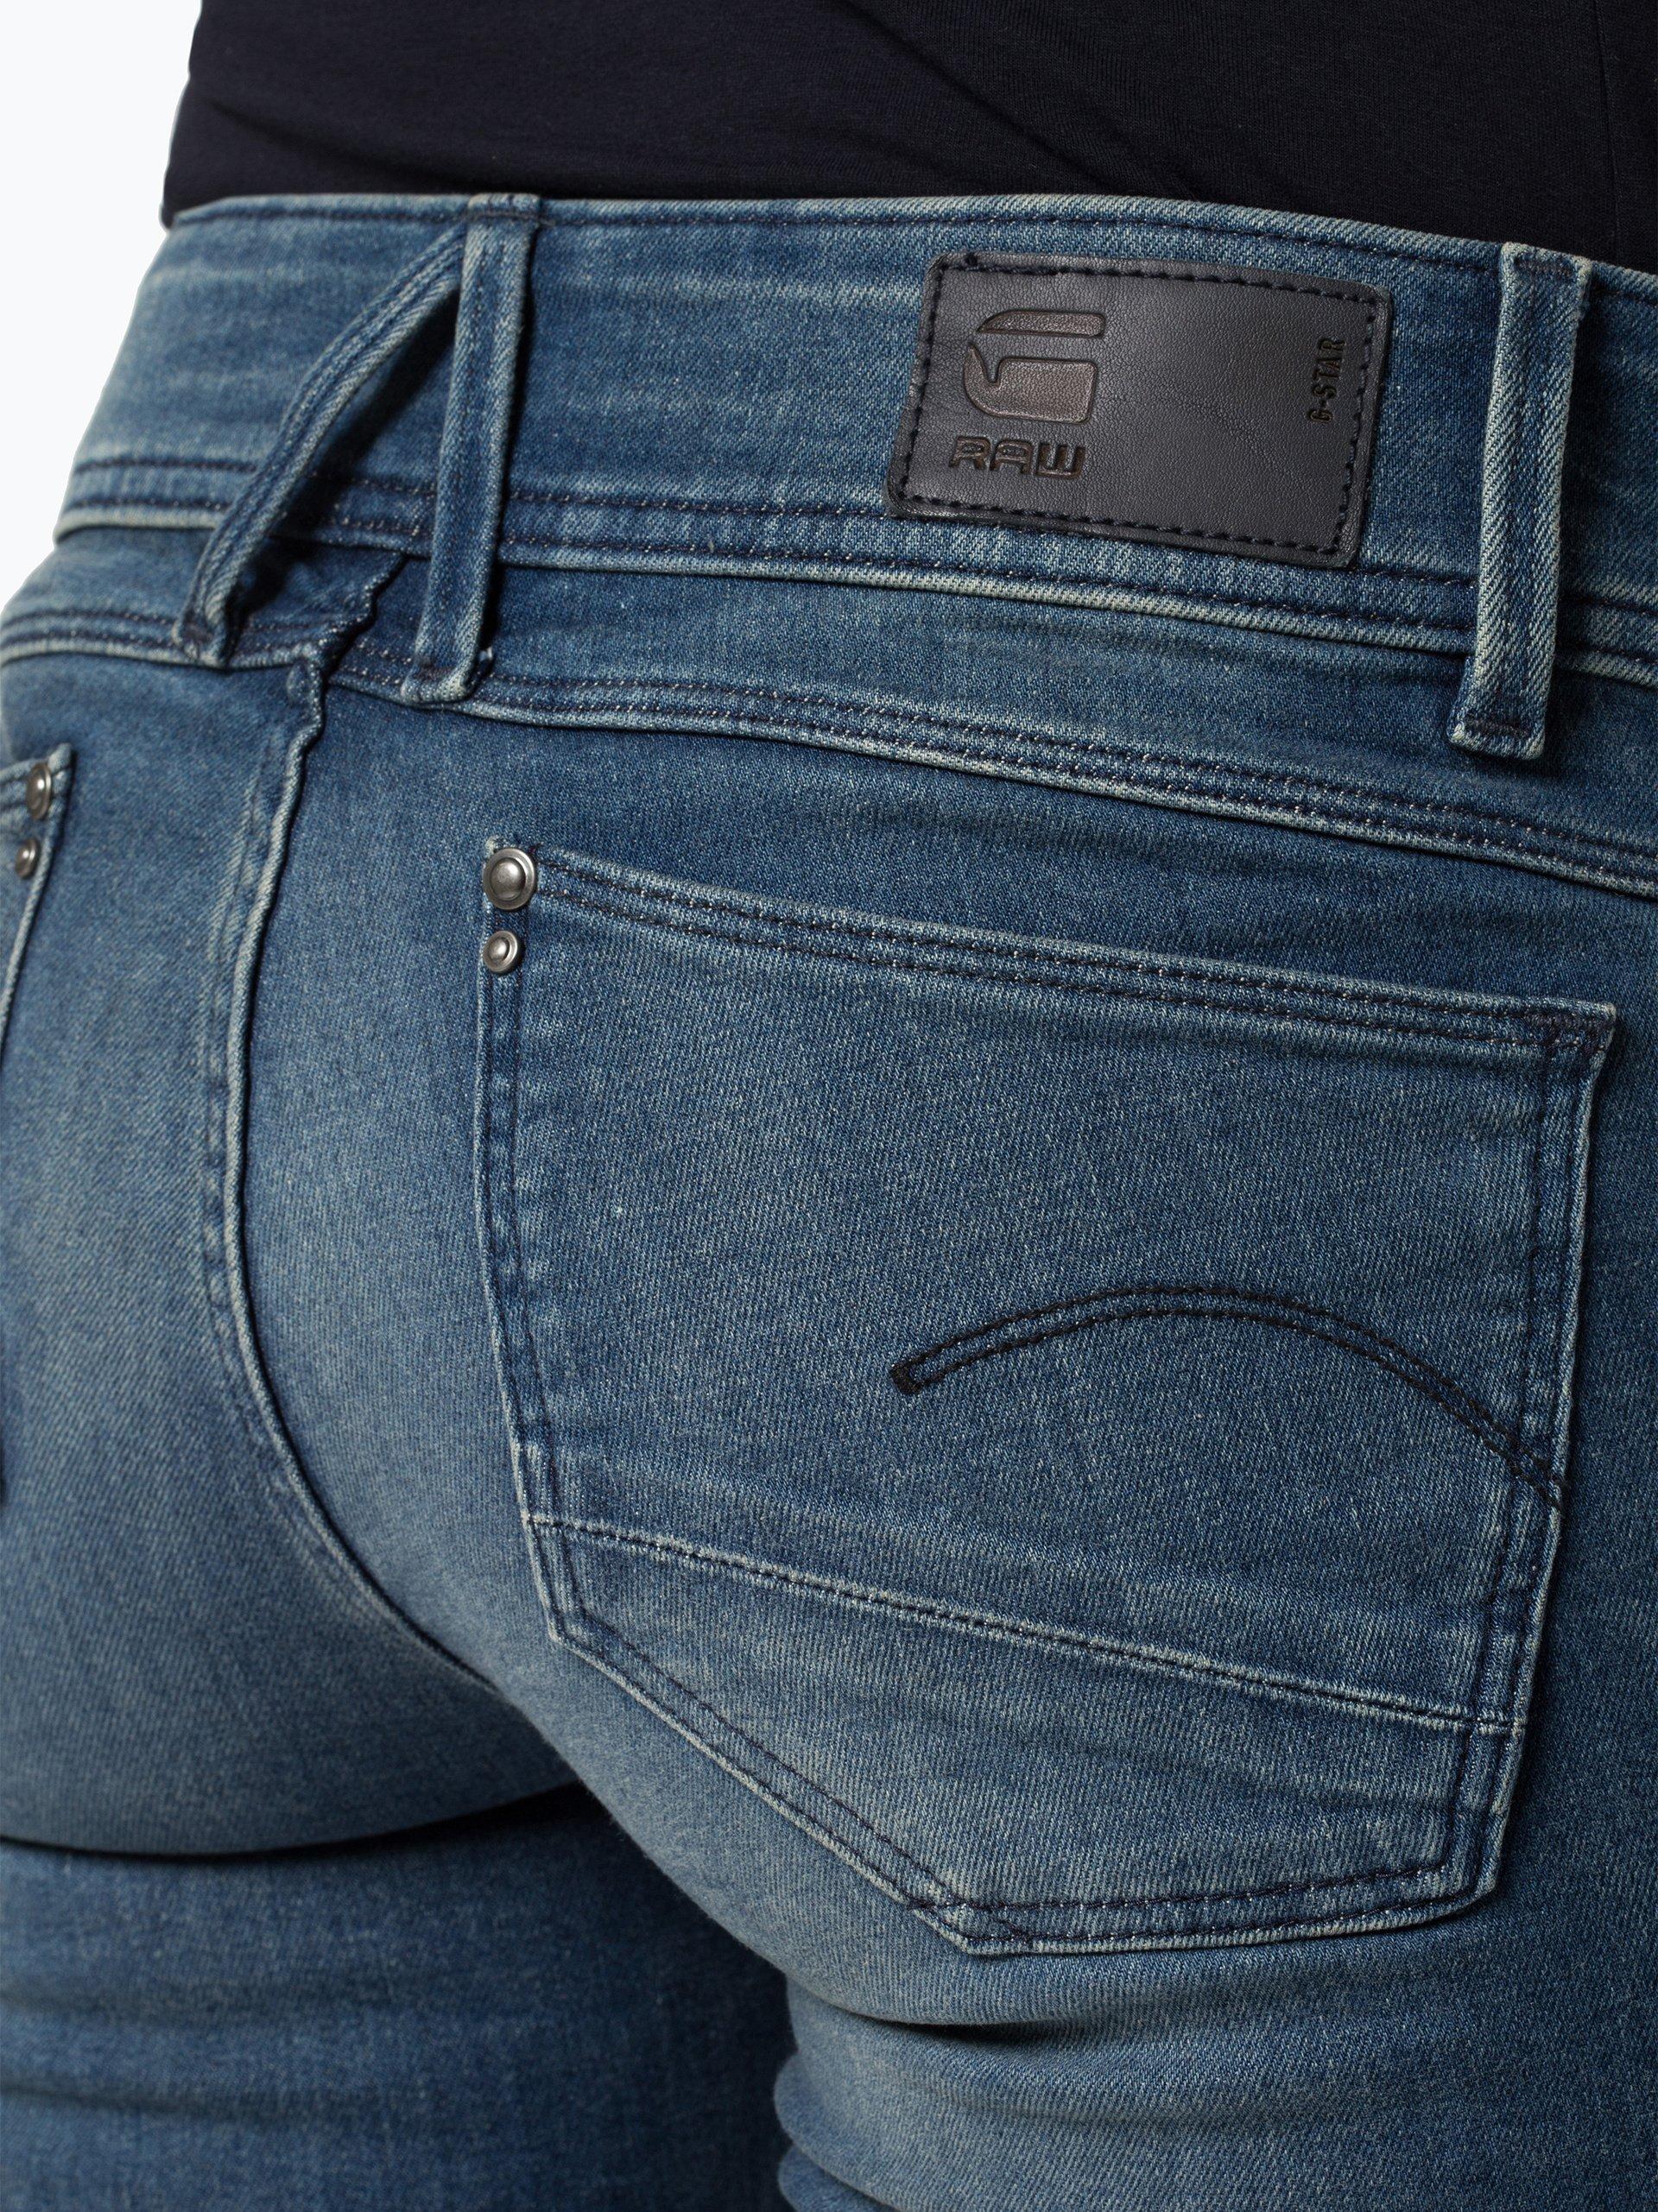 g star damen jeans lynn mehrfarbig blau uni online. Black Bedroom Furniture Sets. Home Design Ideas